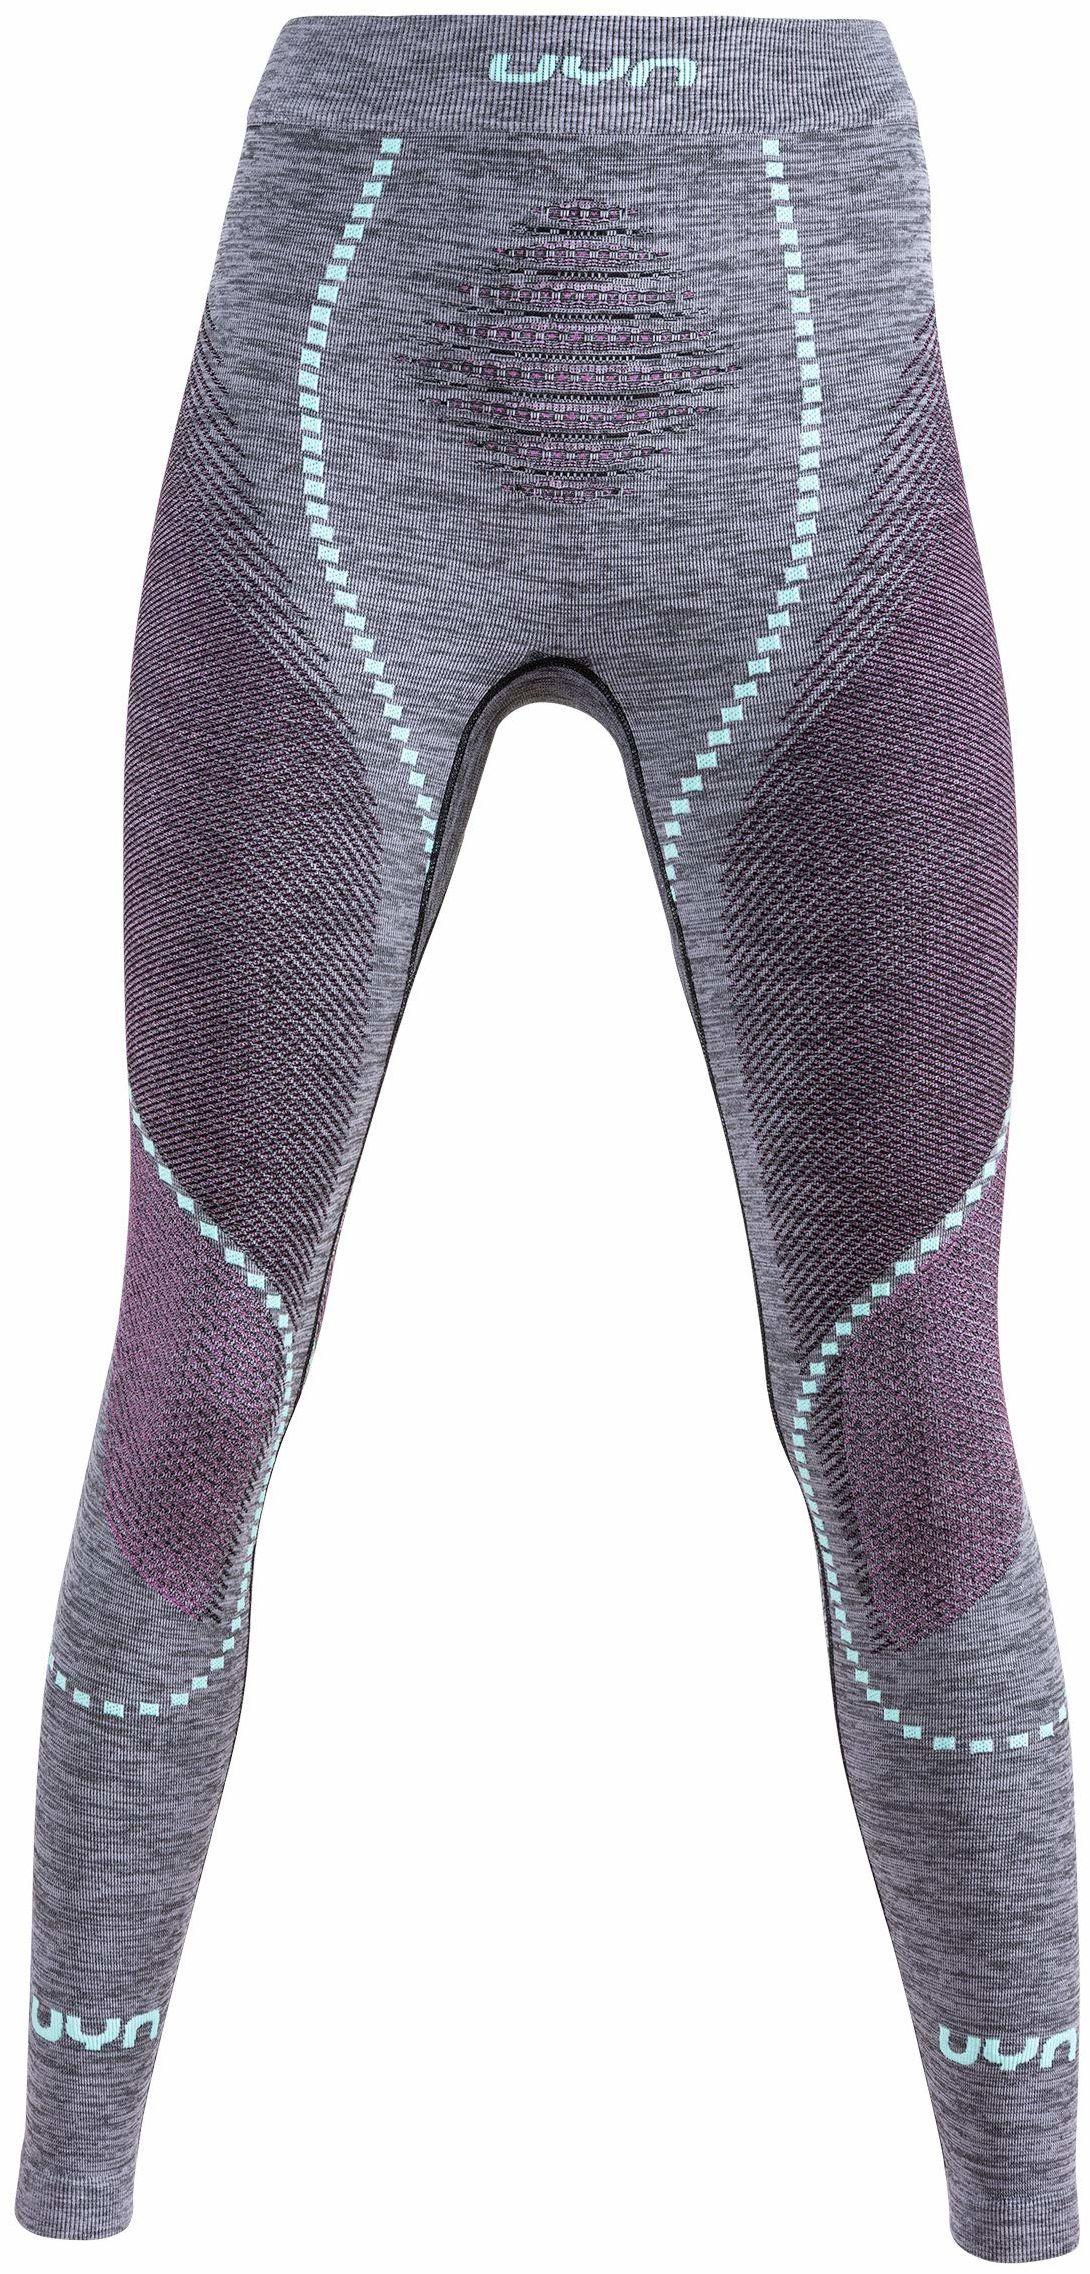 UYN damskie kalesony Uyn Lady Ambityon Uw Pant Long Melange czarny Black Melange/Pink/Aqua L-XL